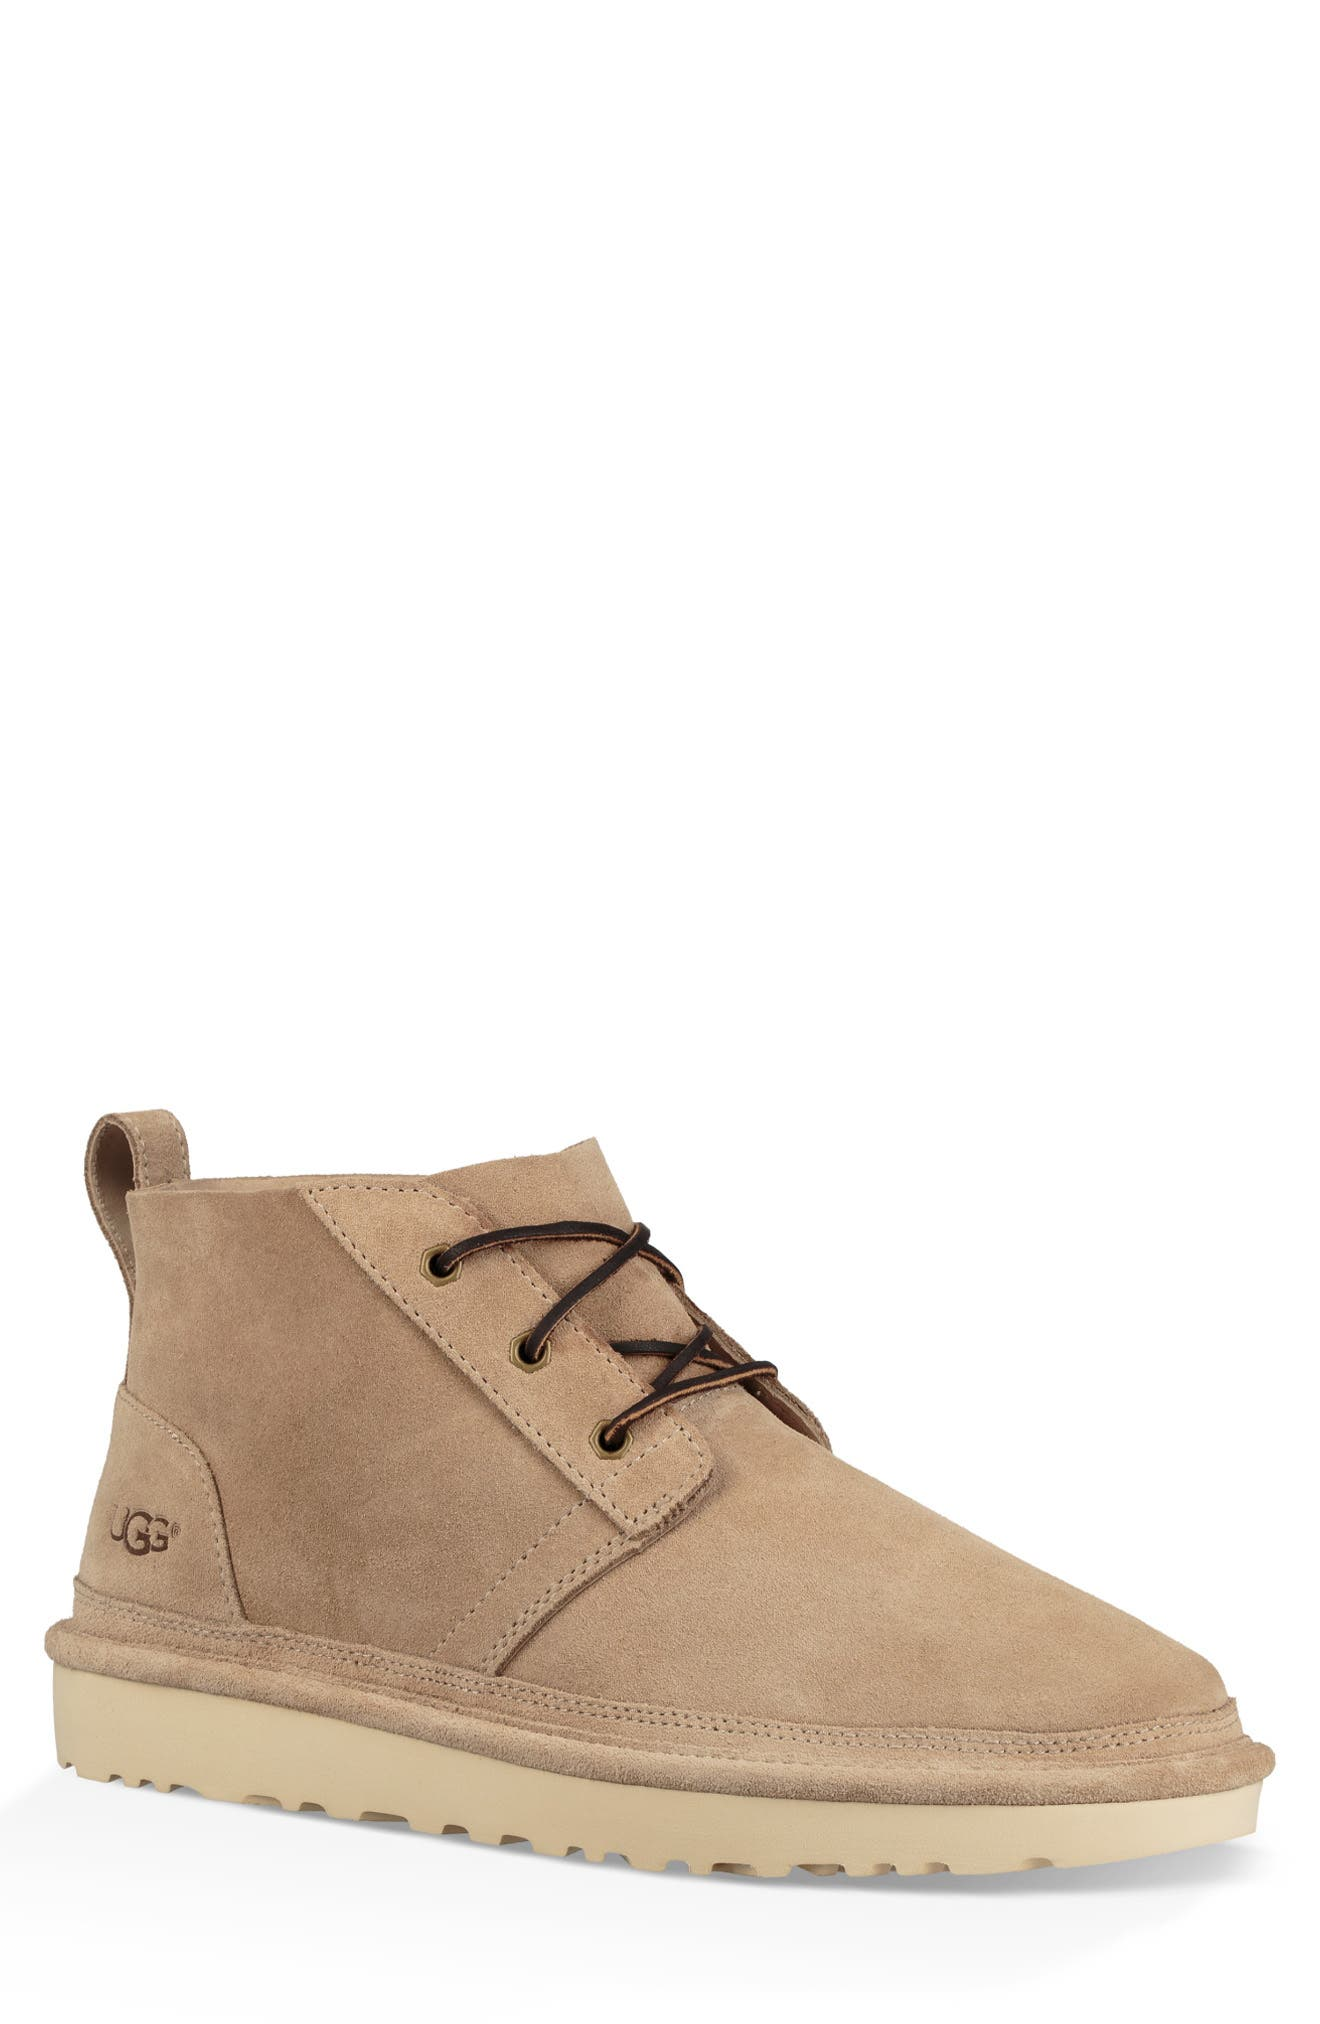 ugg desert boots Metallic